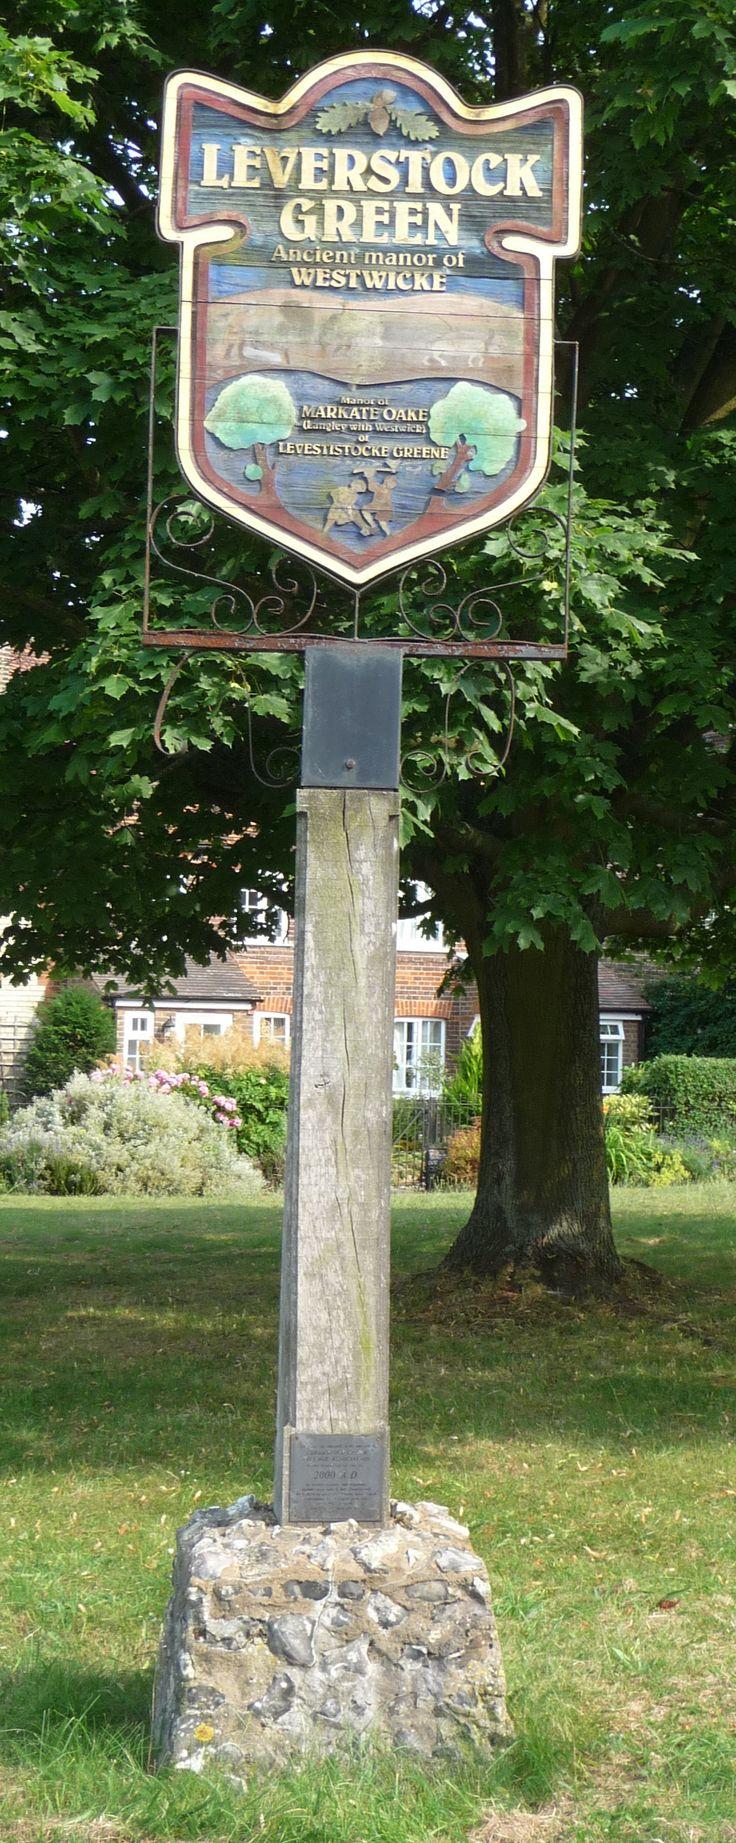 Leverstock Green village sign